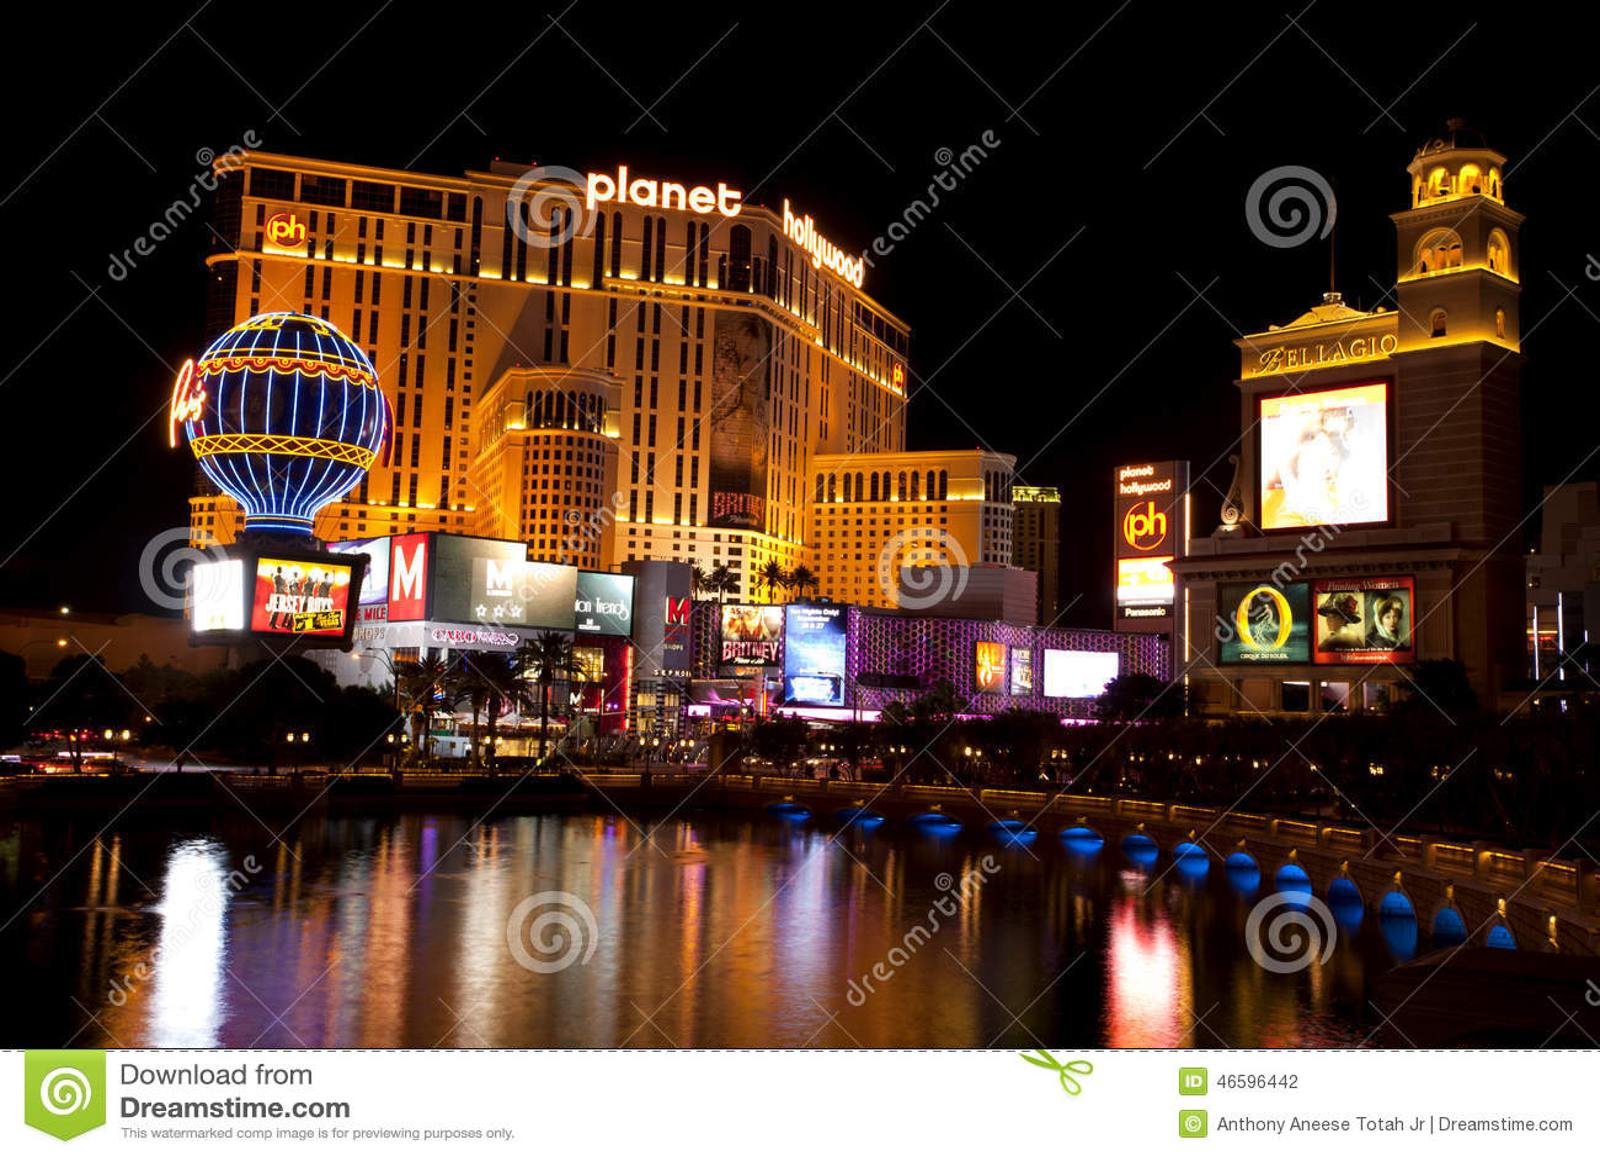 Hollywoodcasinos winstar world casino ok